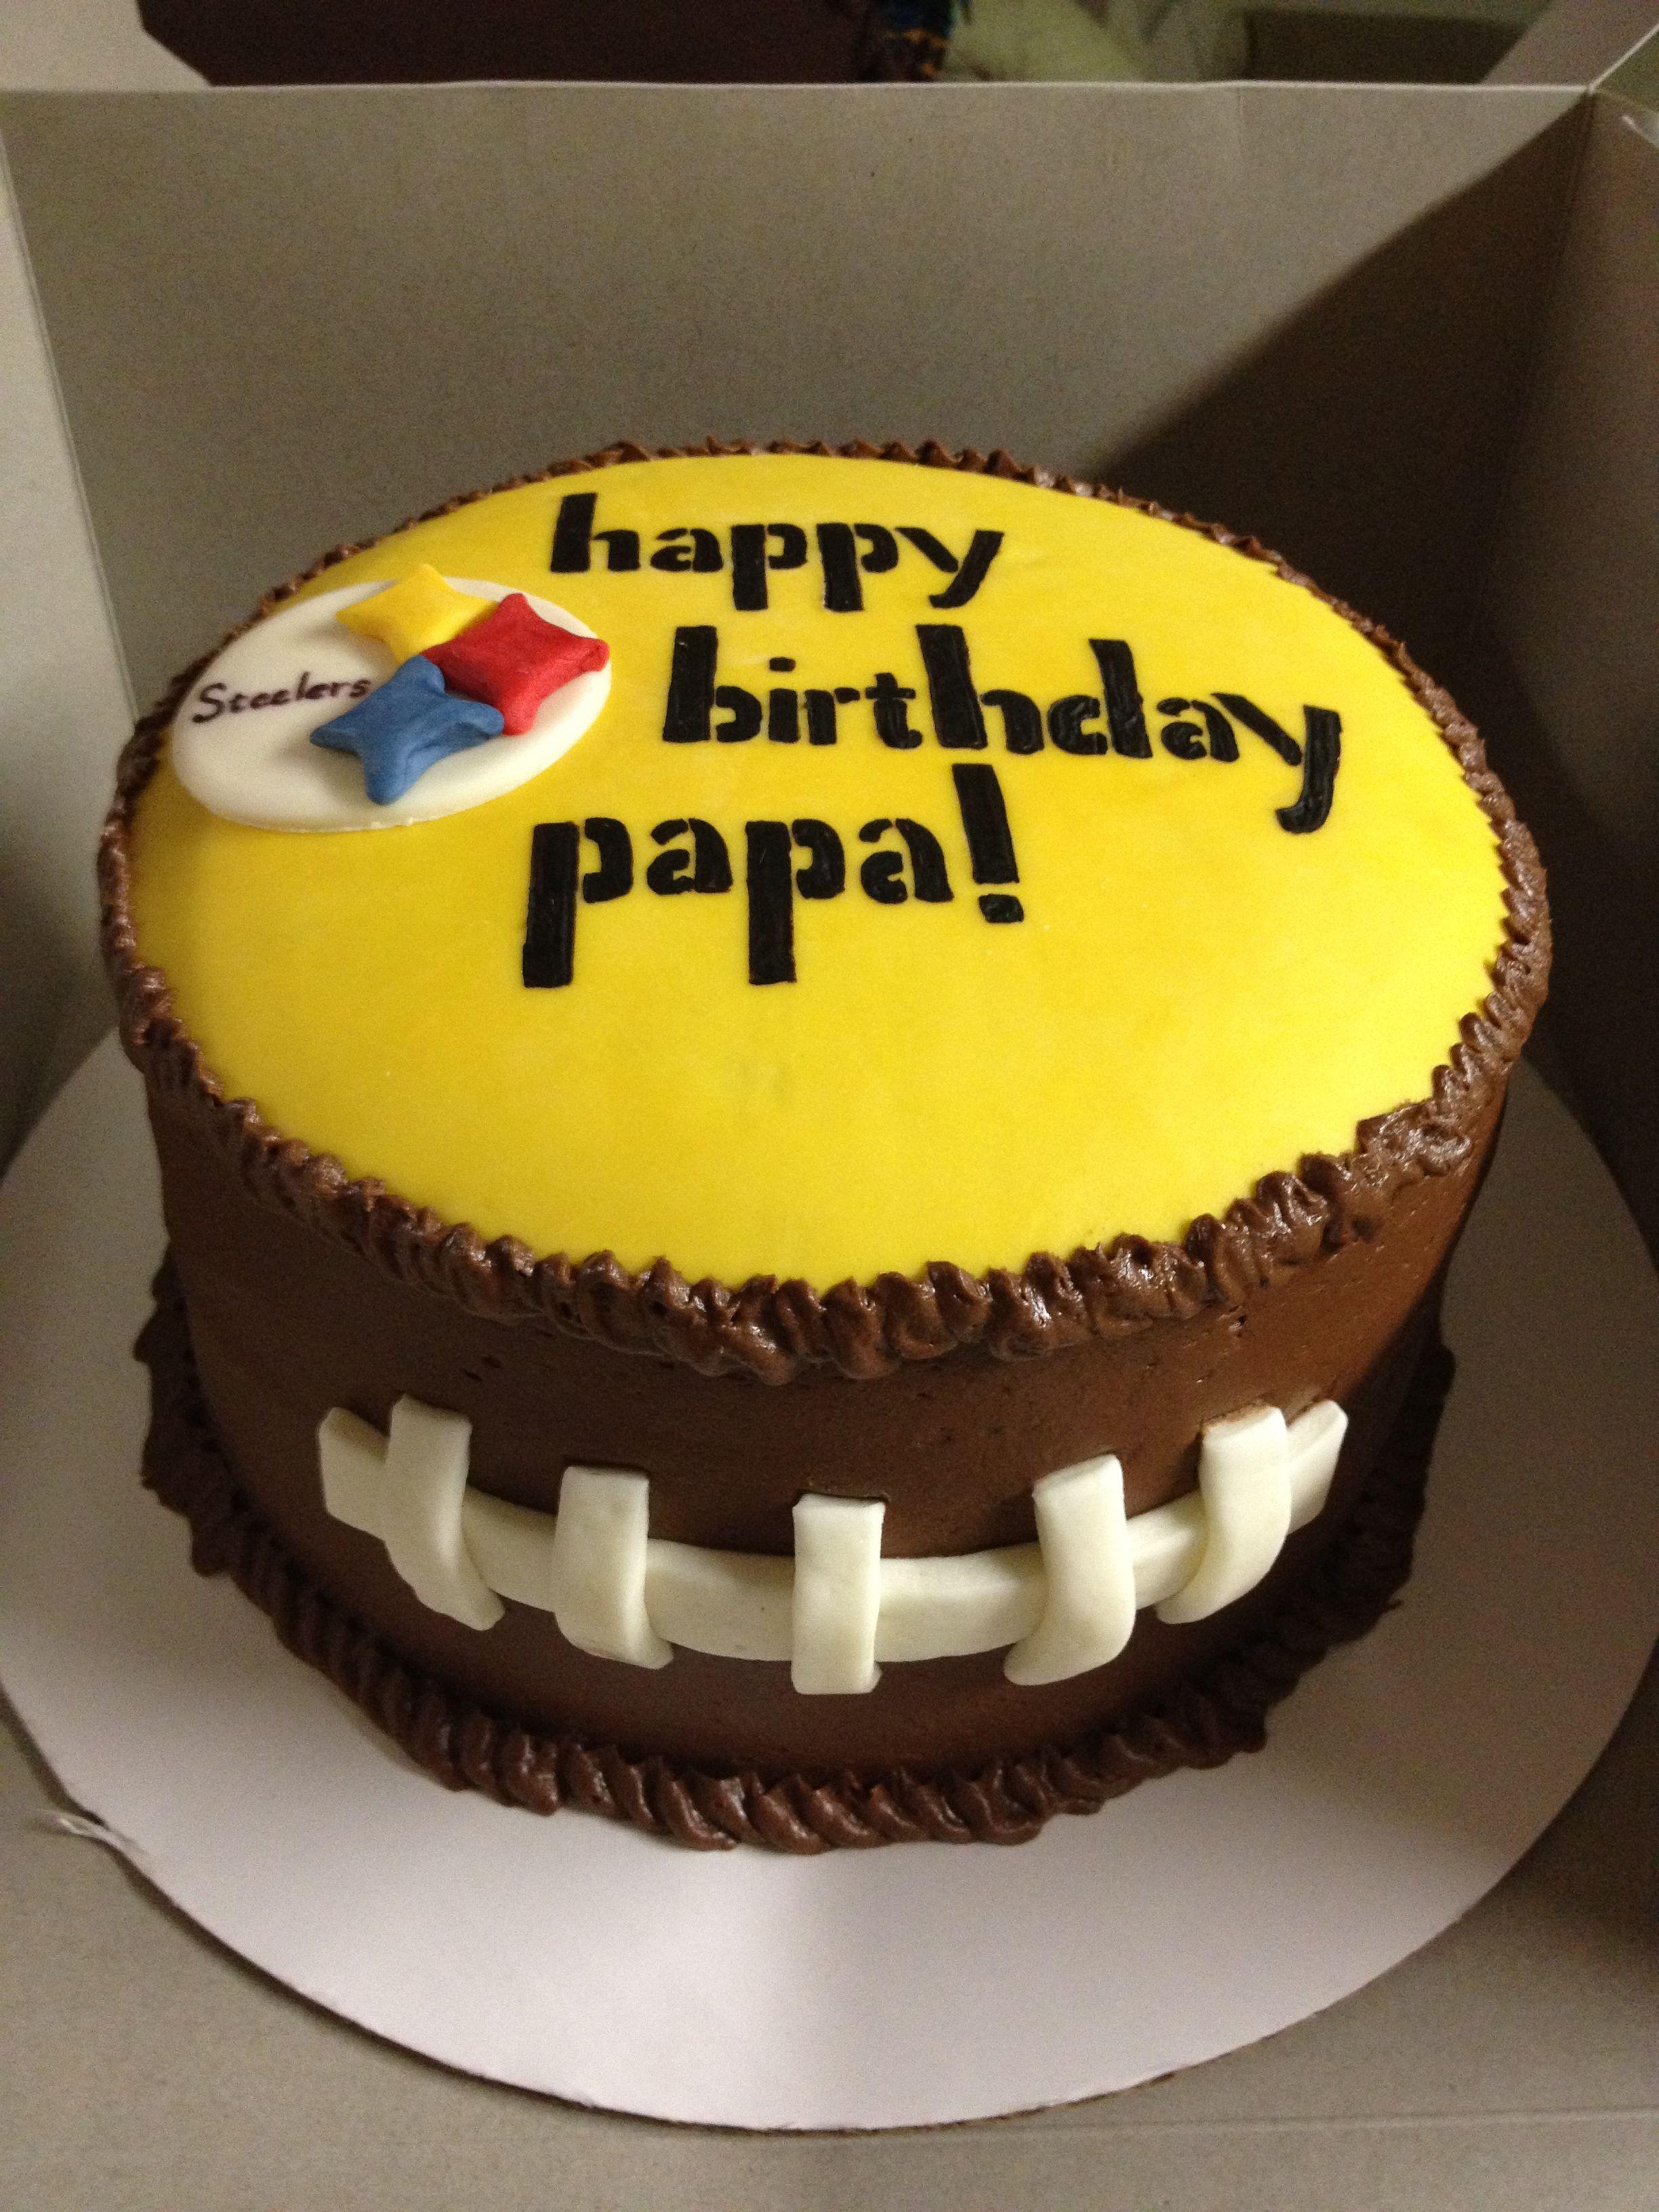 Steeler terrible towel birthday cake Cake ideas Pinterest